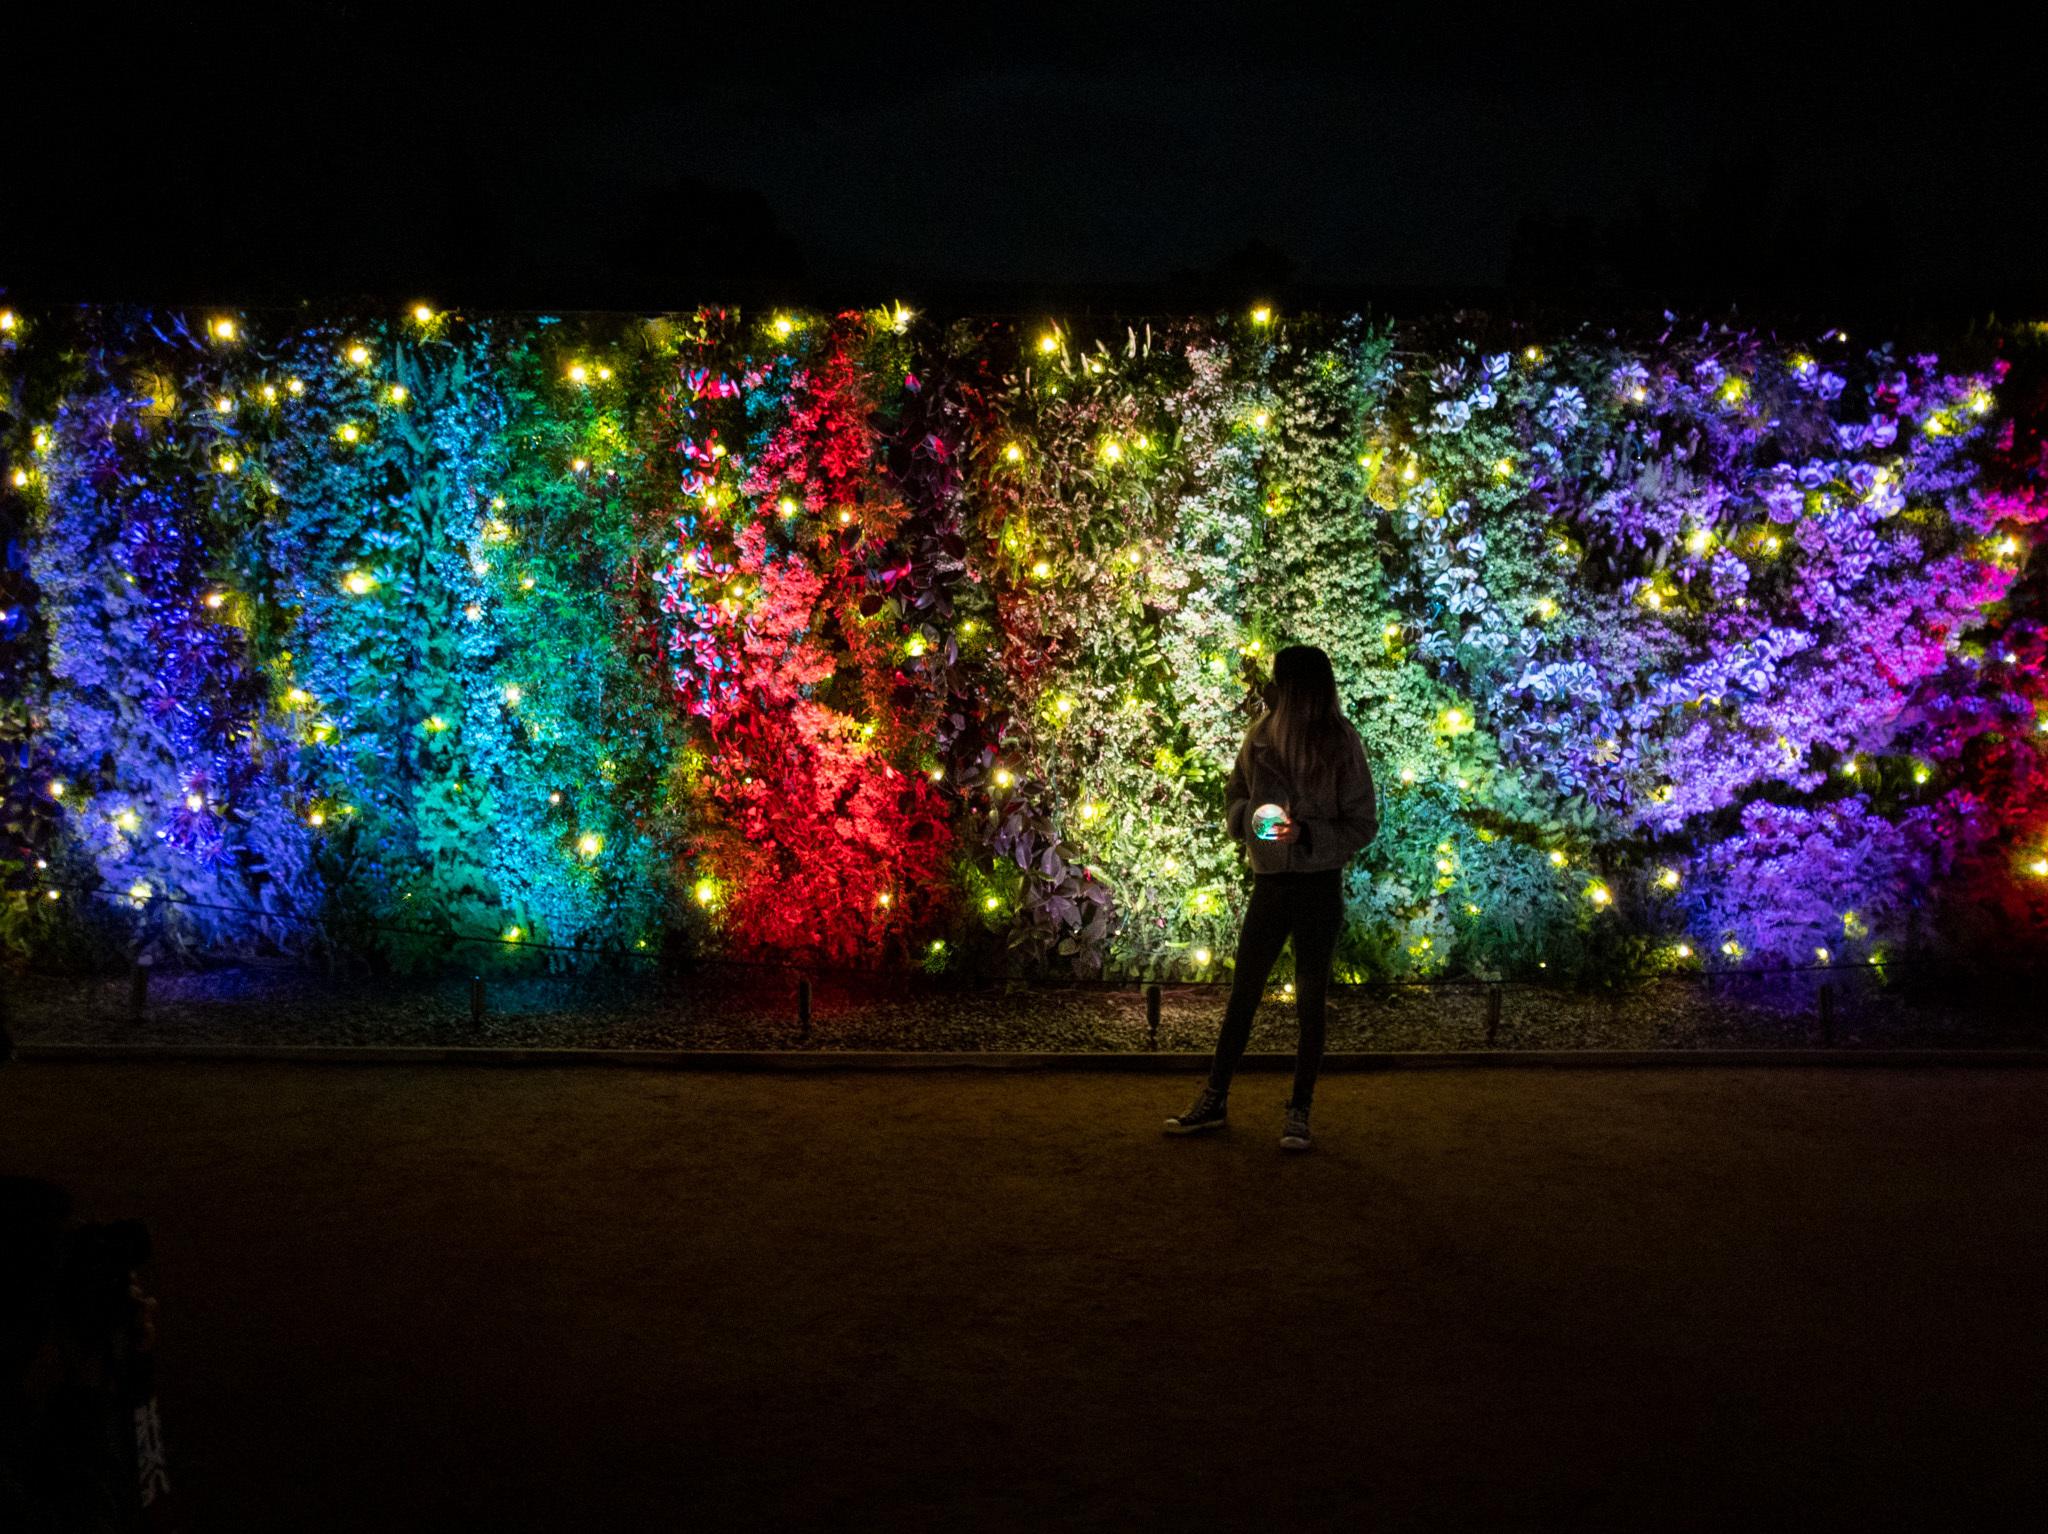 South Coast Botanic Garden S Glow Illuminates The Grounds